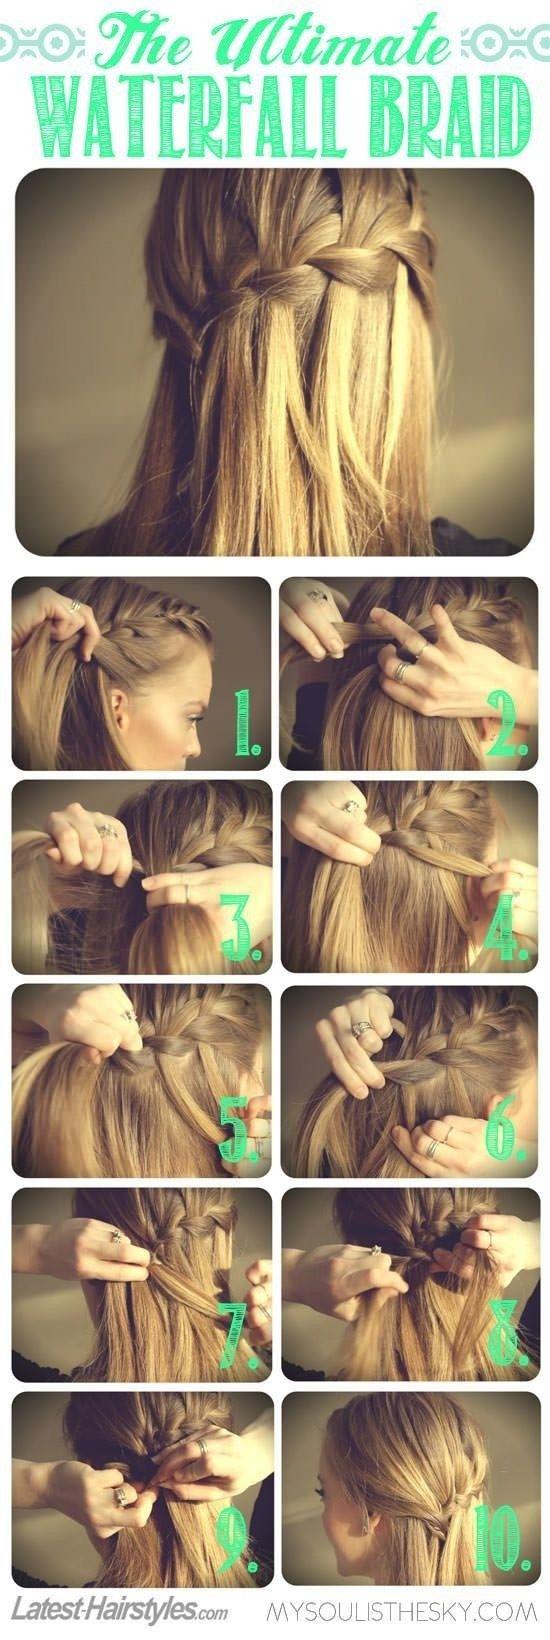 10 Best Waterfall Braids: Hairstyle Ideas for Long Hair | PoPular Haircuts